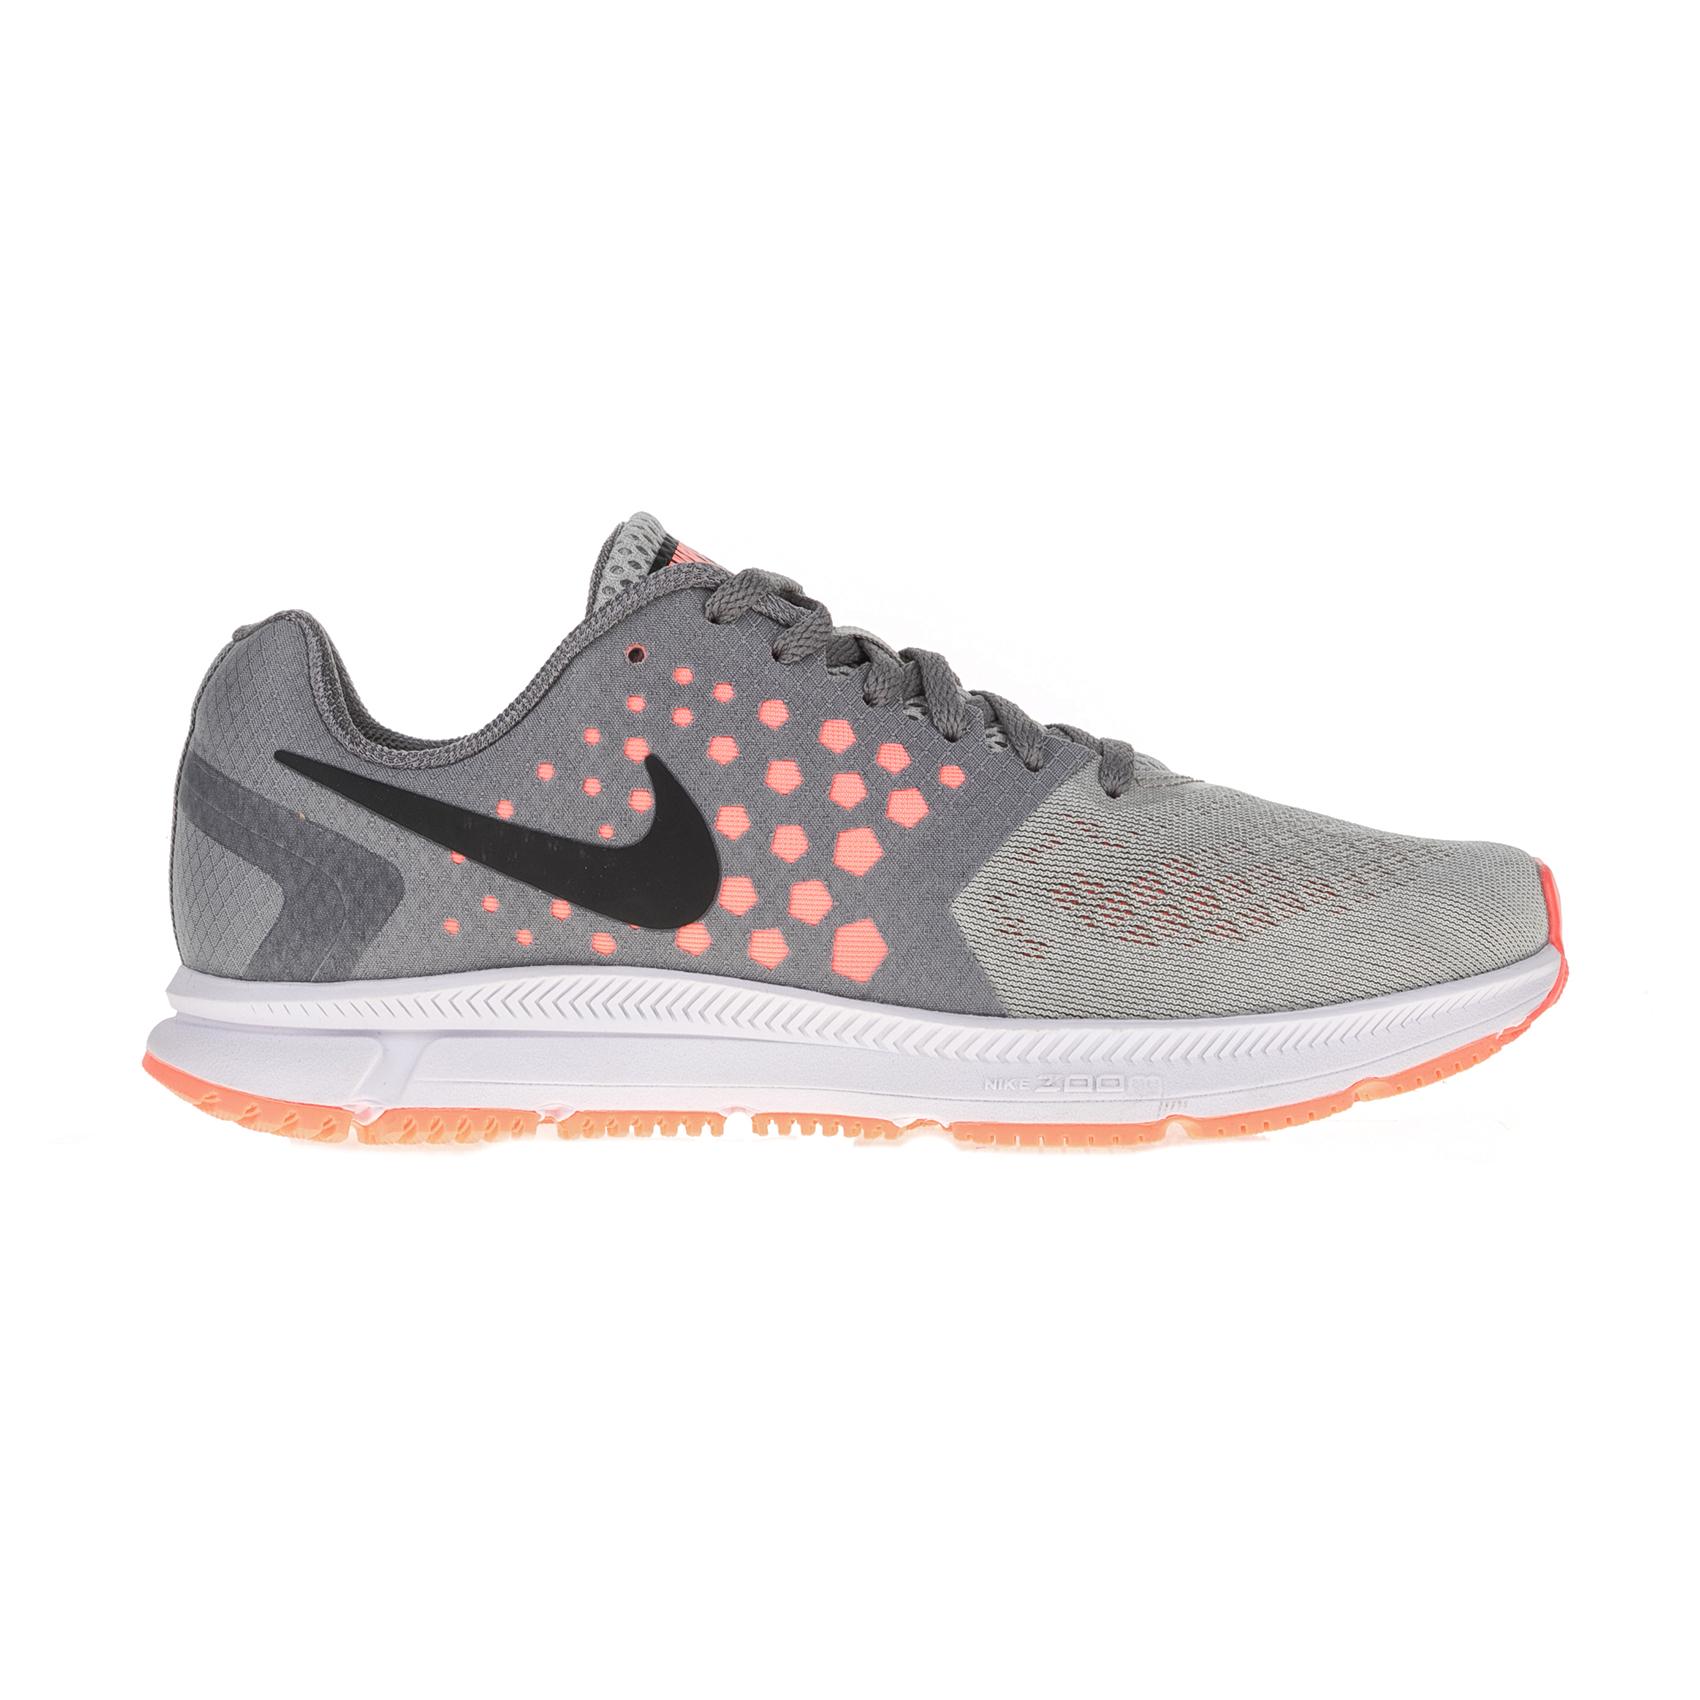 NIKE – Γυναικεία αθλητικά παπούτσια Nike ZOOM SPAN γκρι -πορτοκαλί